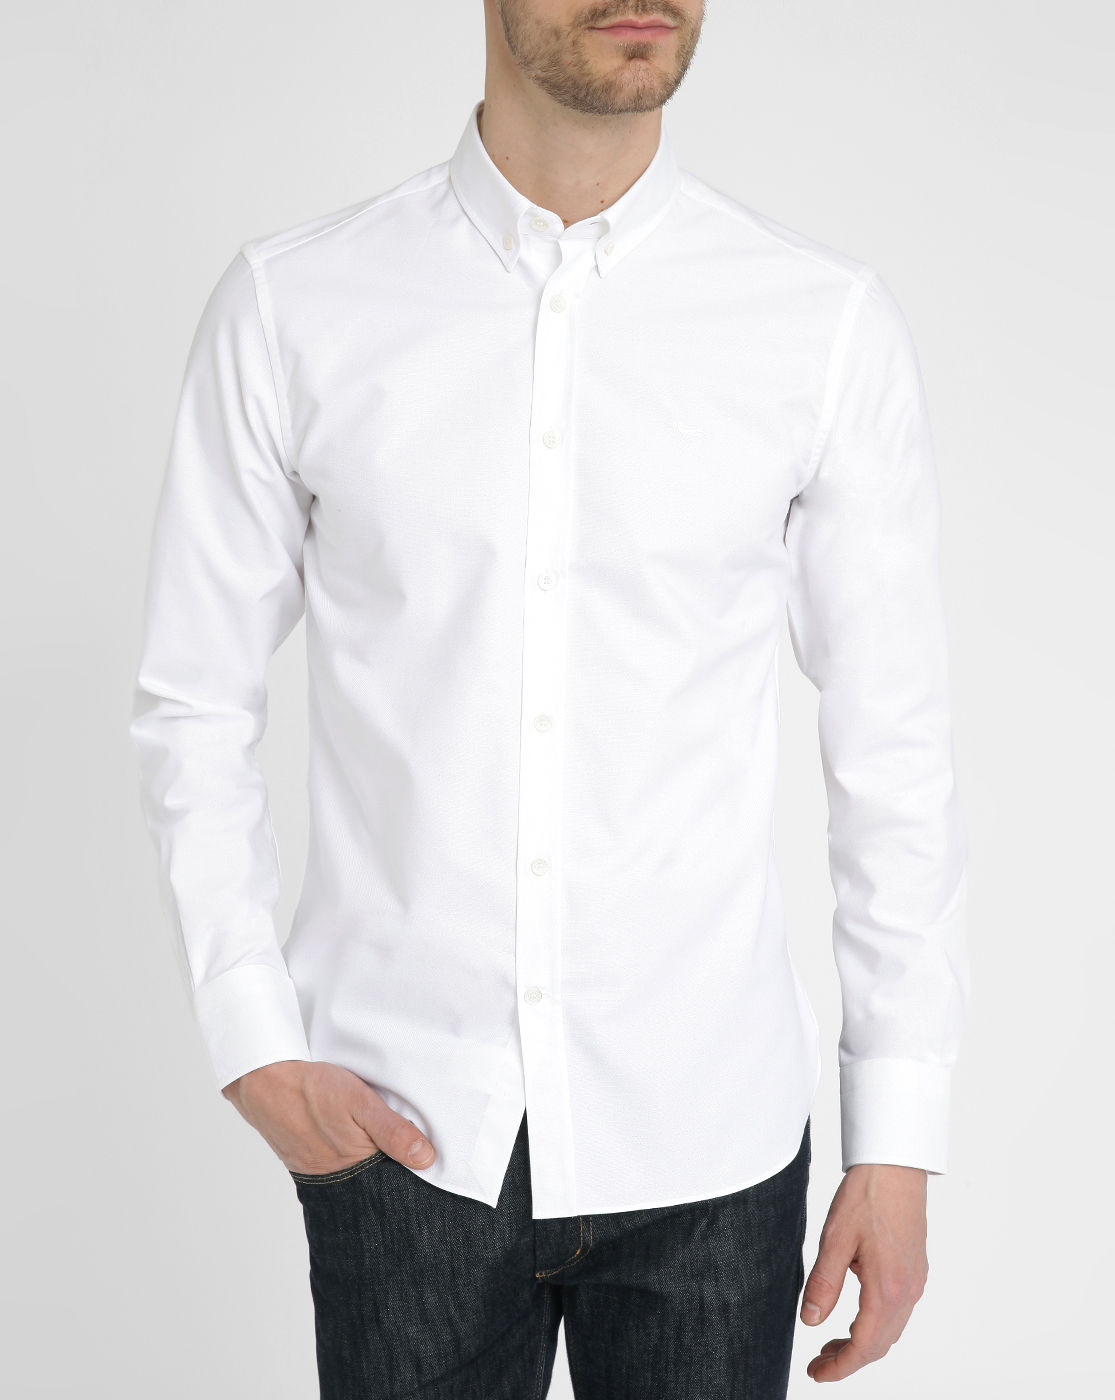 Maison kitsun white oxford embroidered shirt in white for for White oxford shirt mens